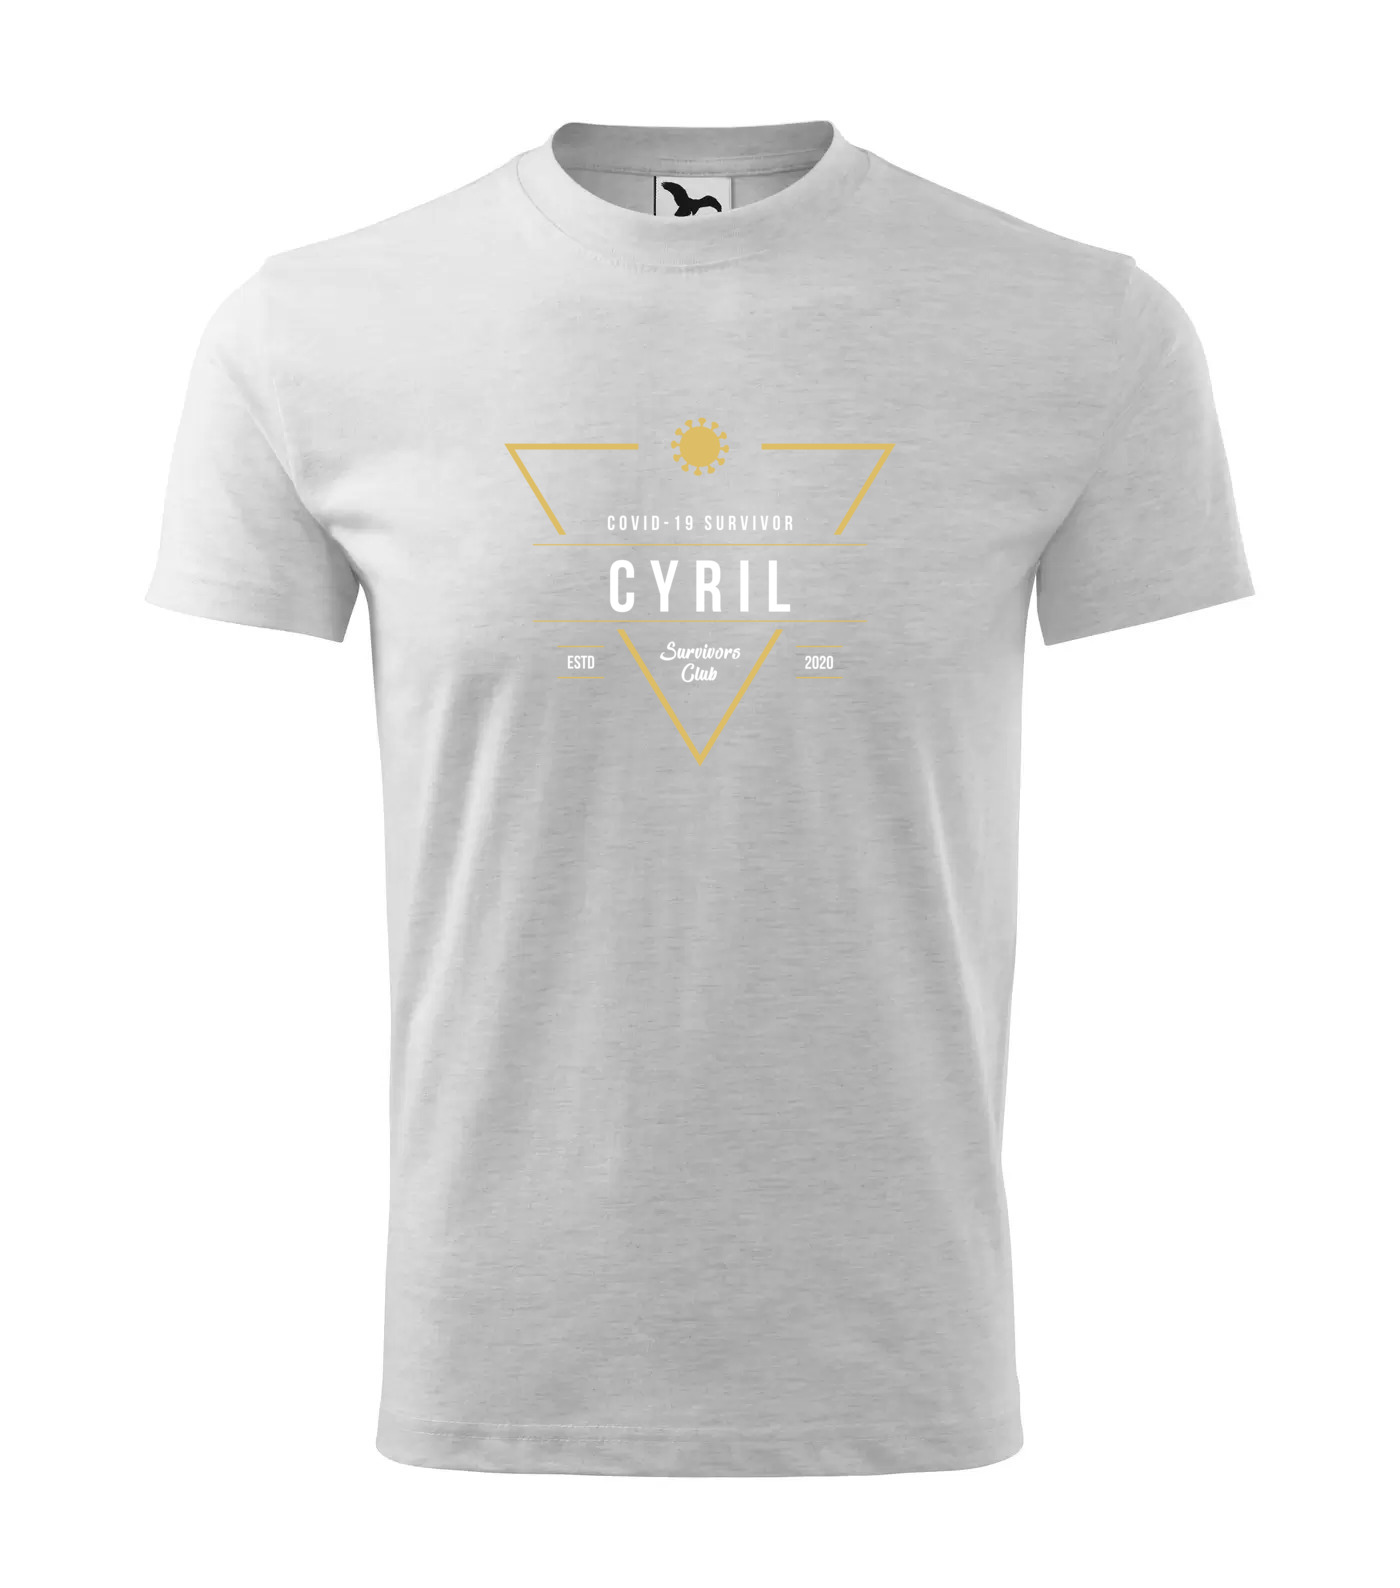 Tričko Survivor Club Cyril